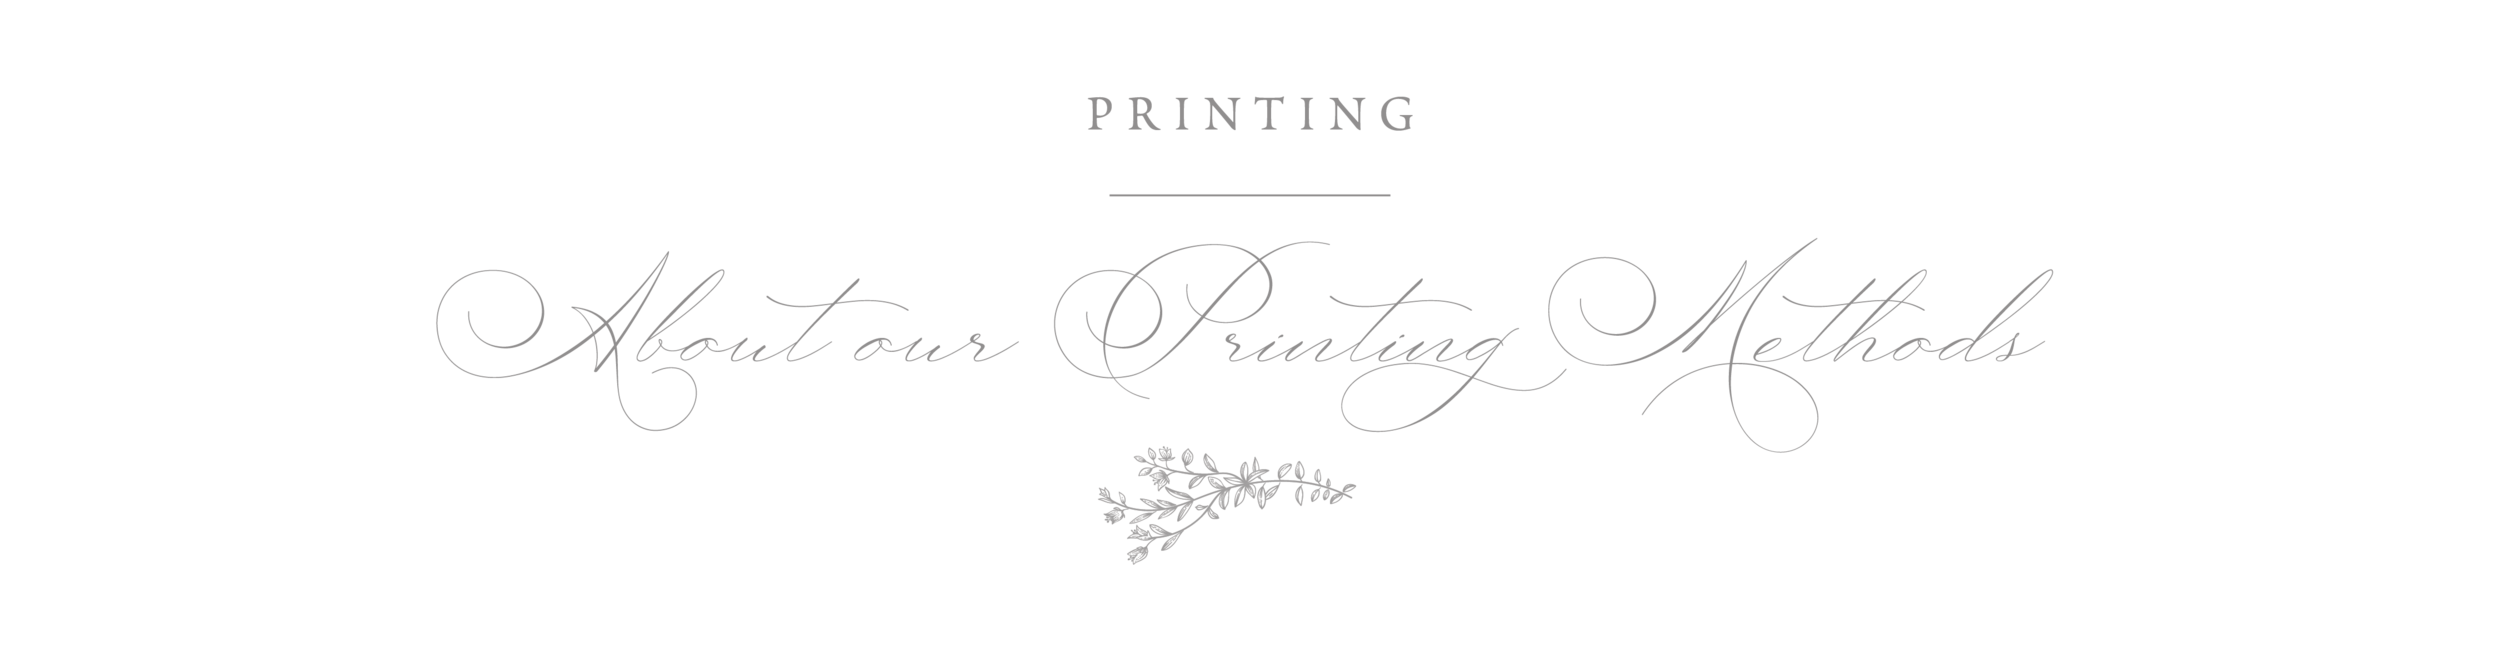 Printing.png